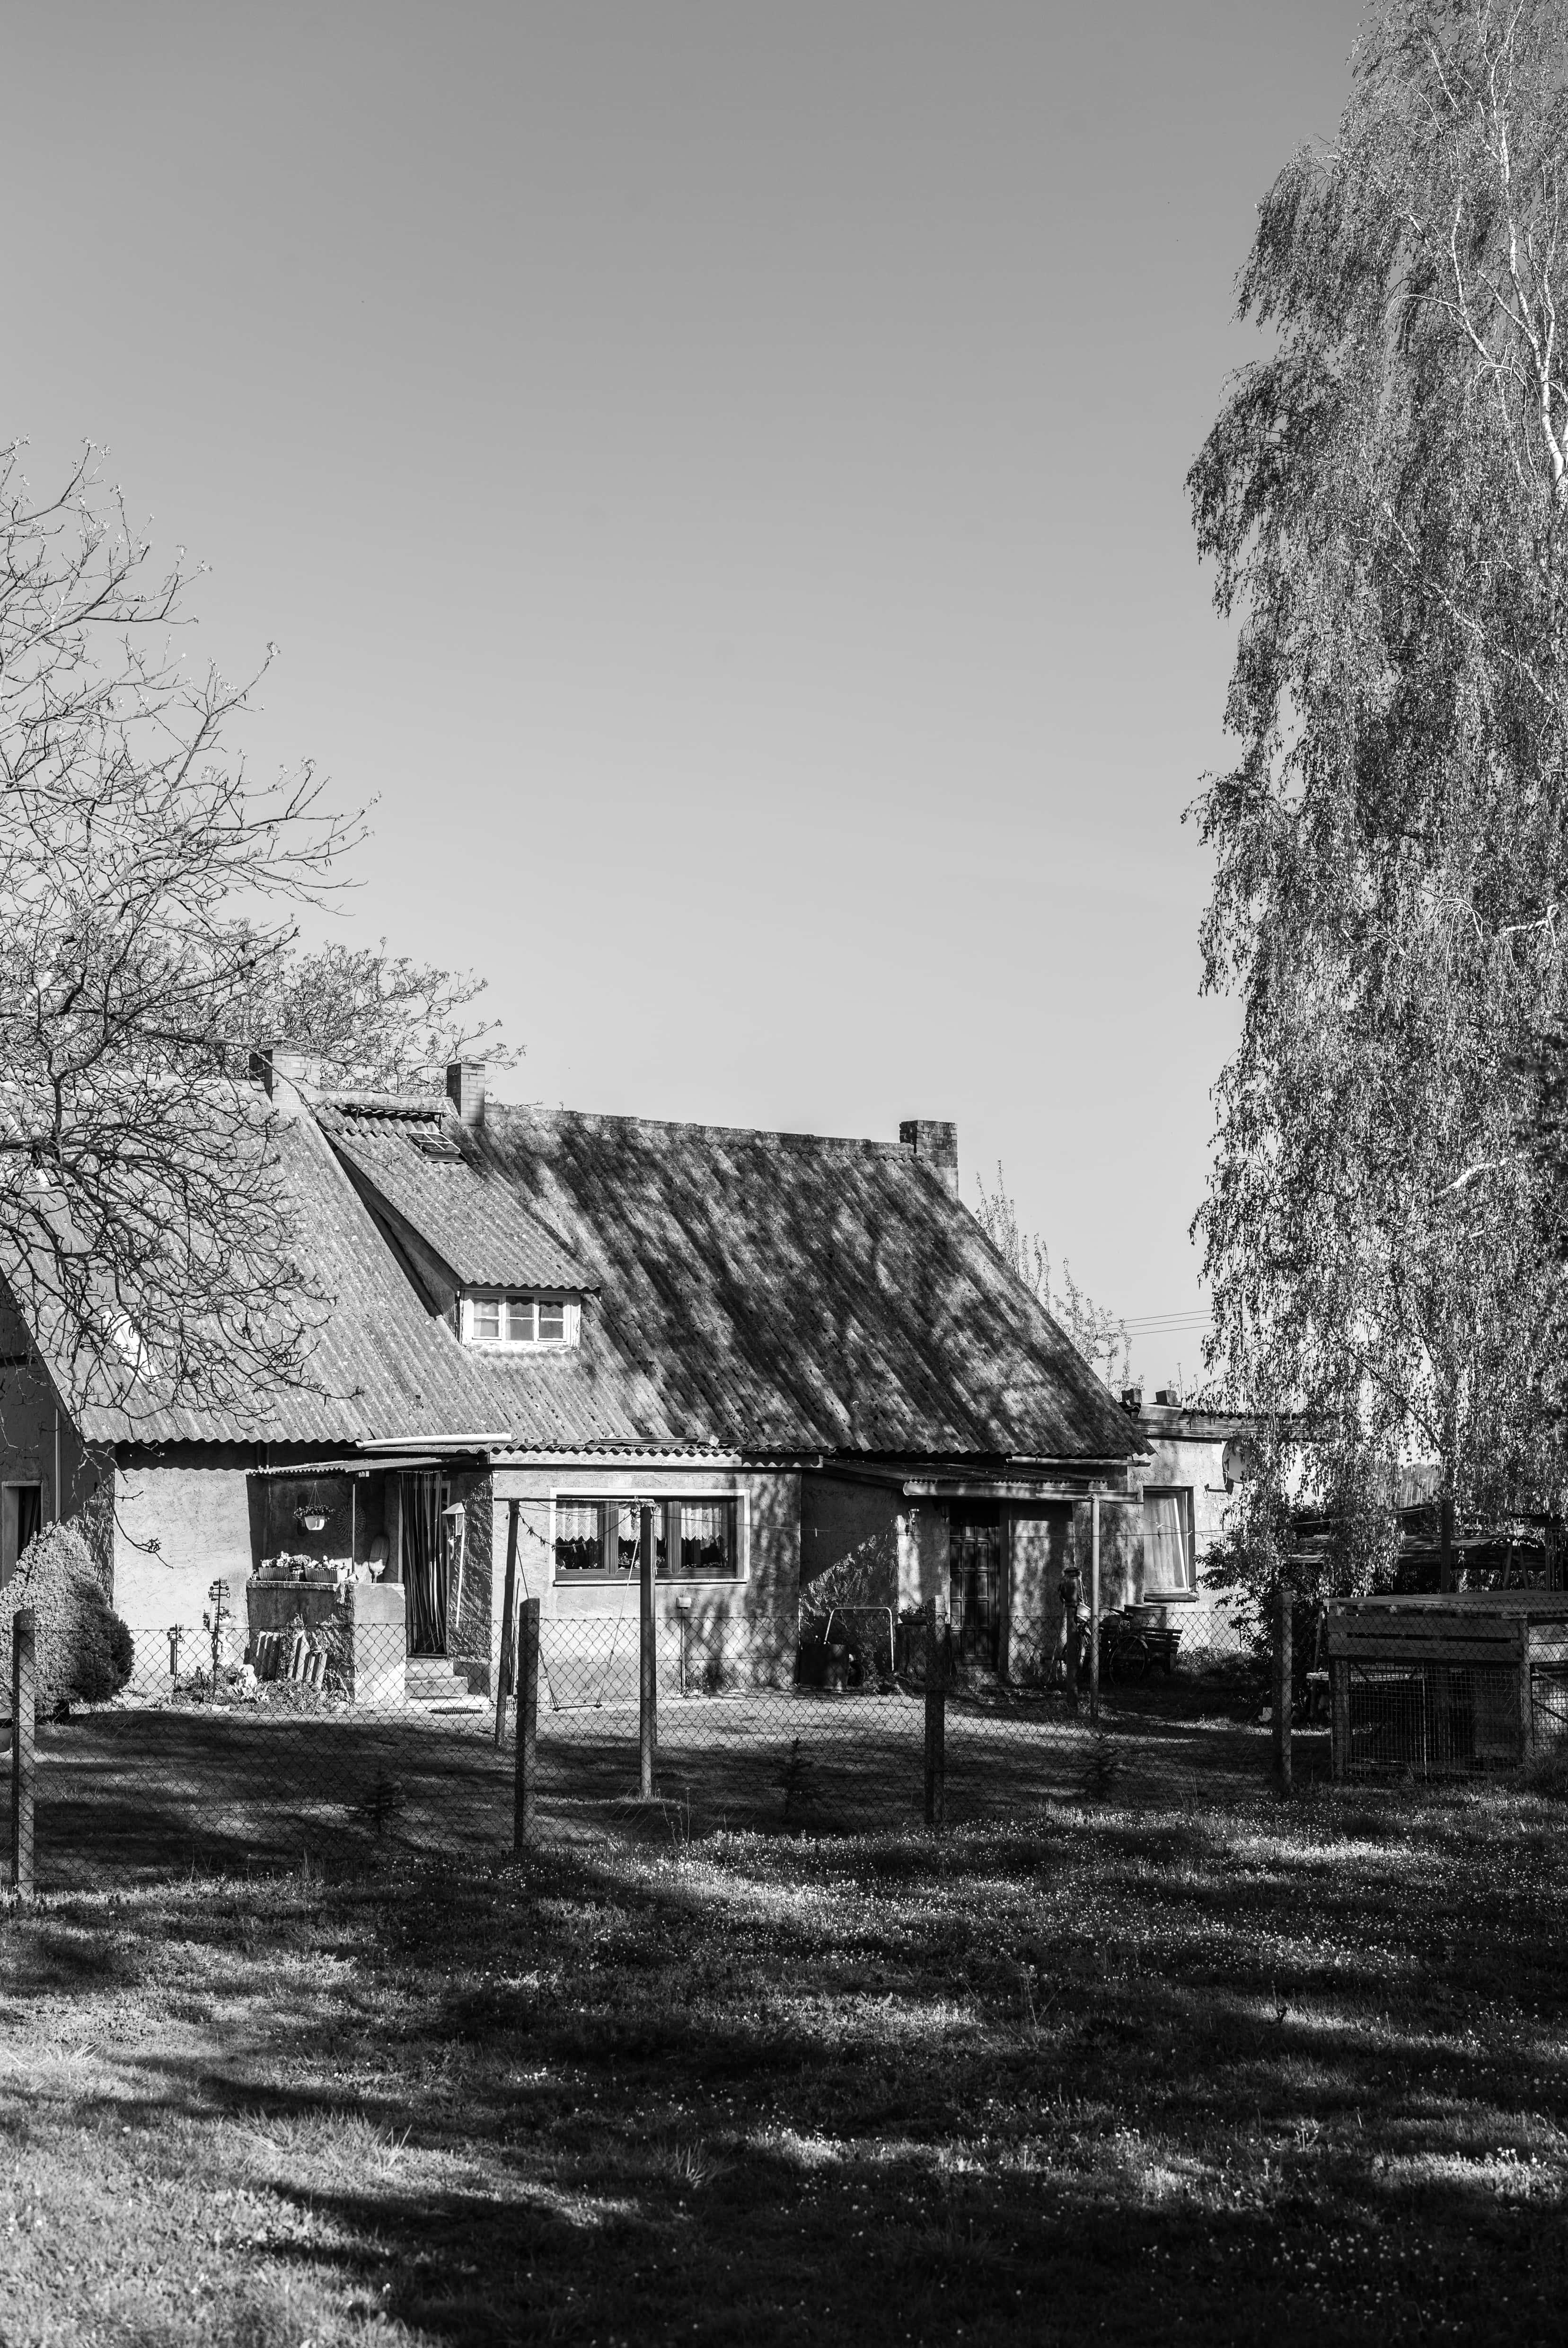 Haus im Premsdorfer Weg in Falkenberg